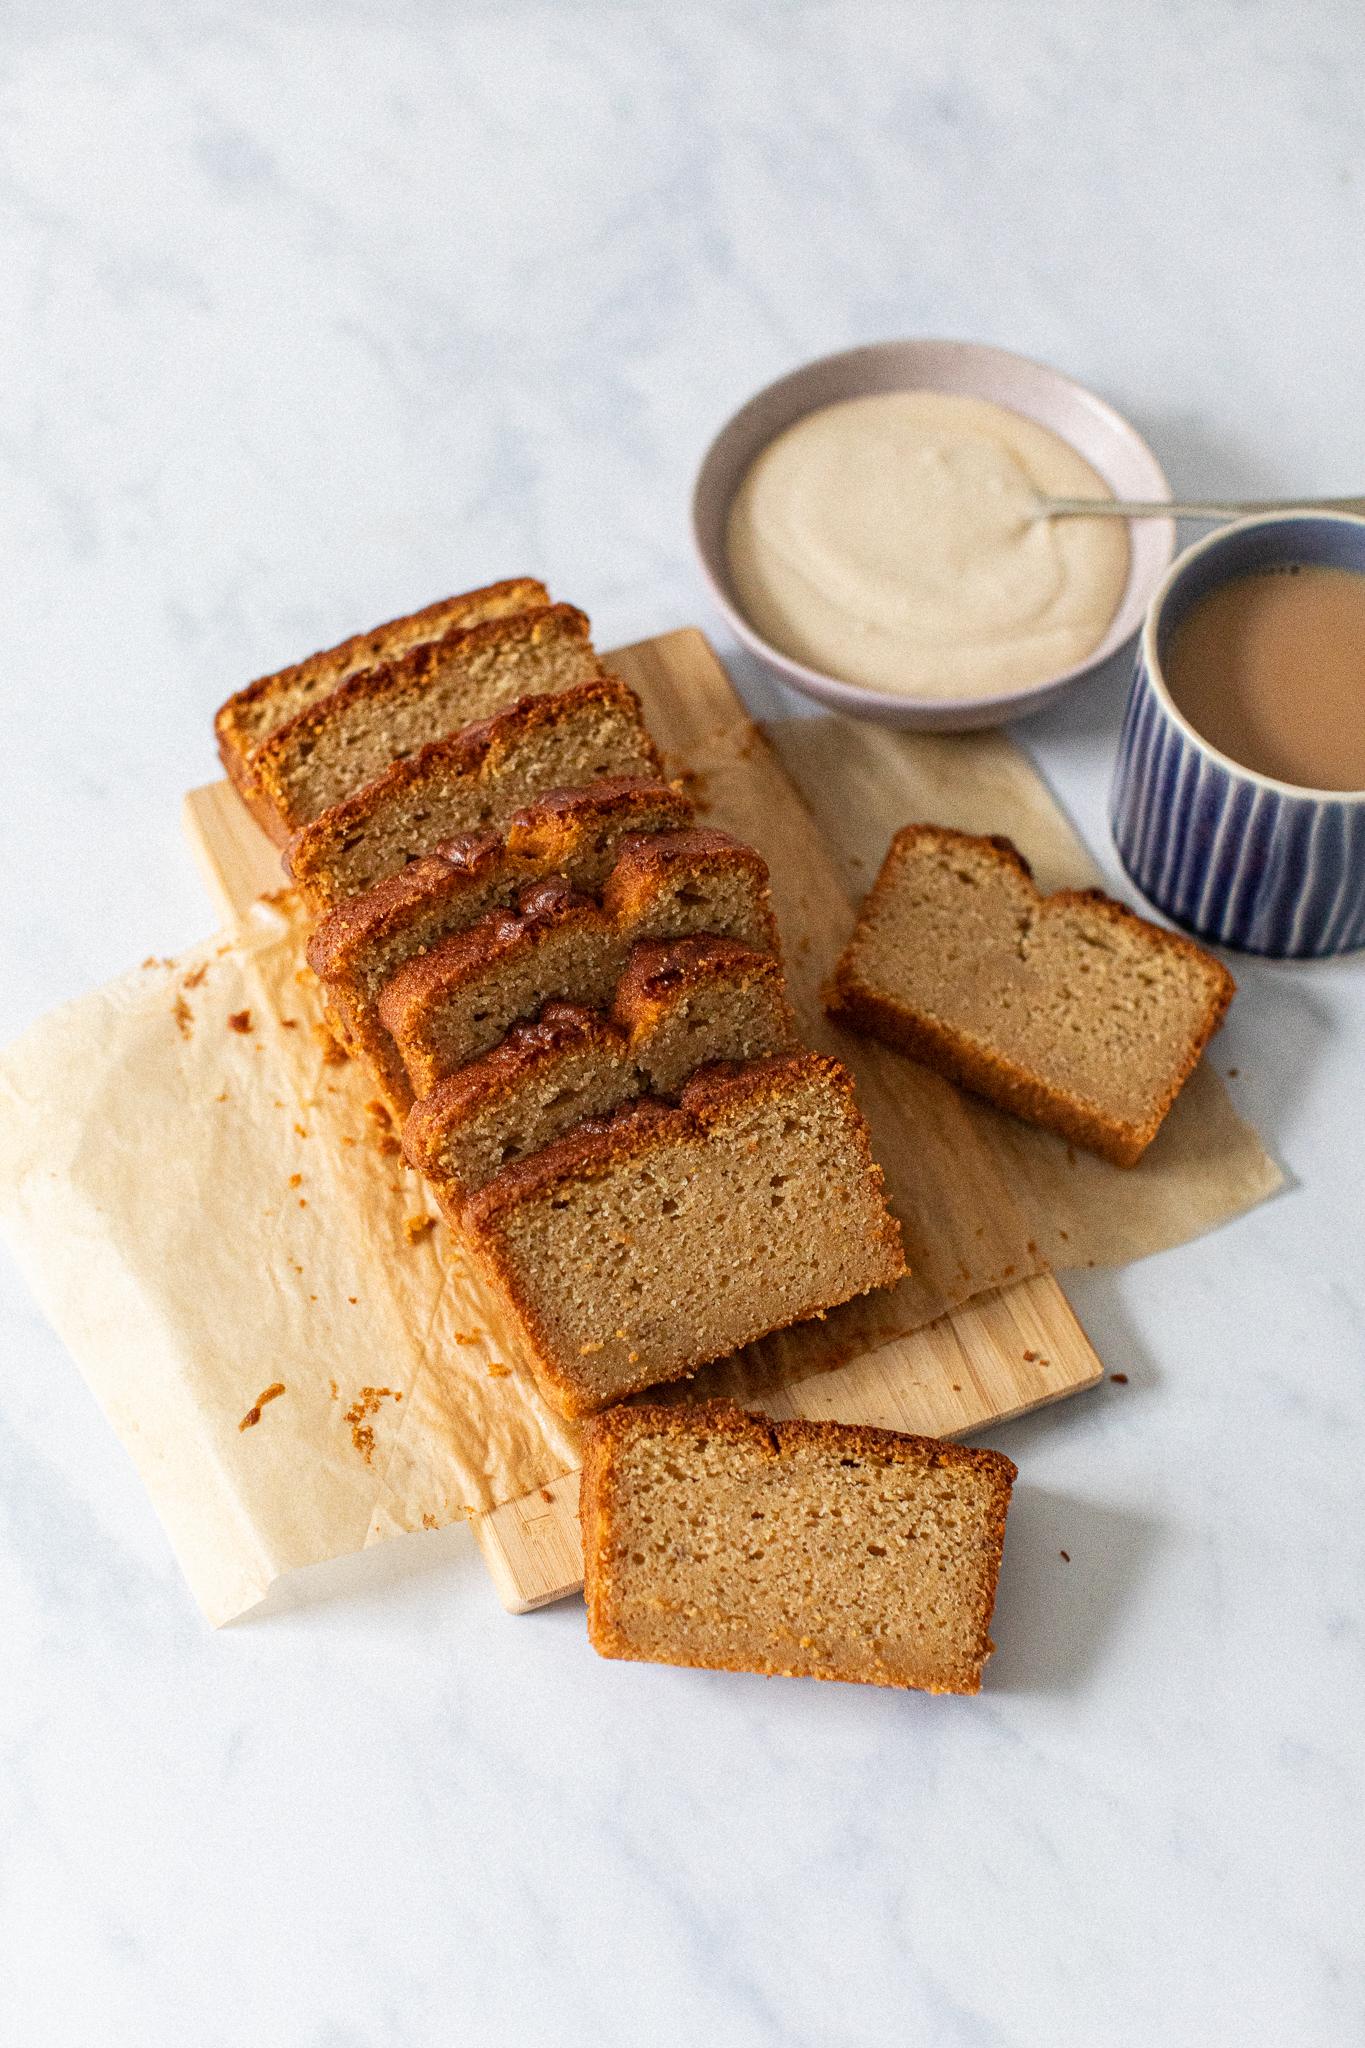 Sliced low FODMAP gluten free coffee and cardamom loaf cake